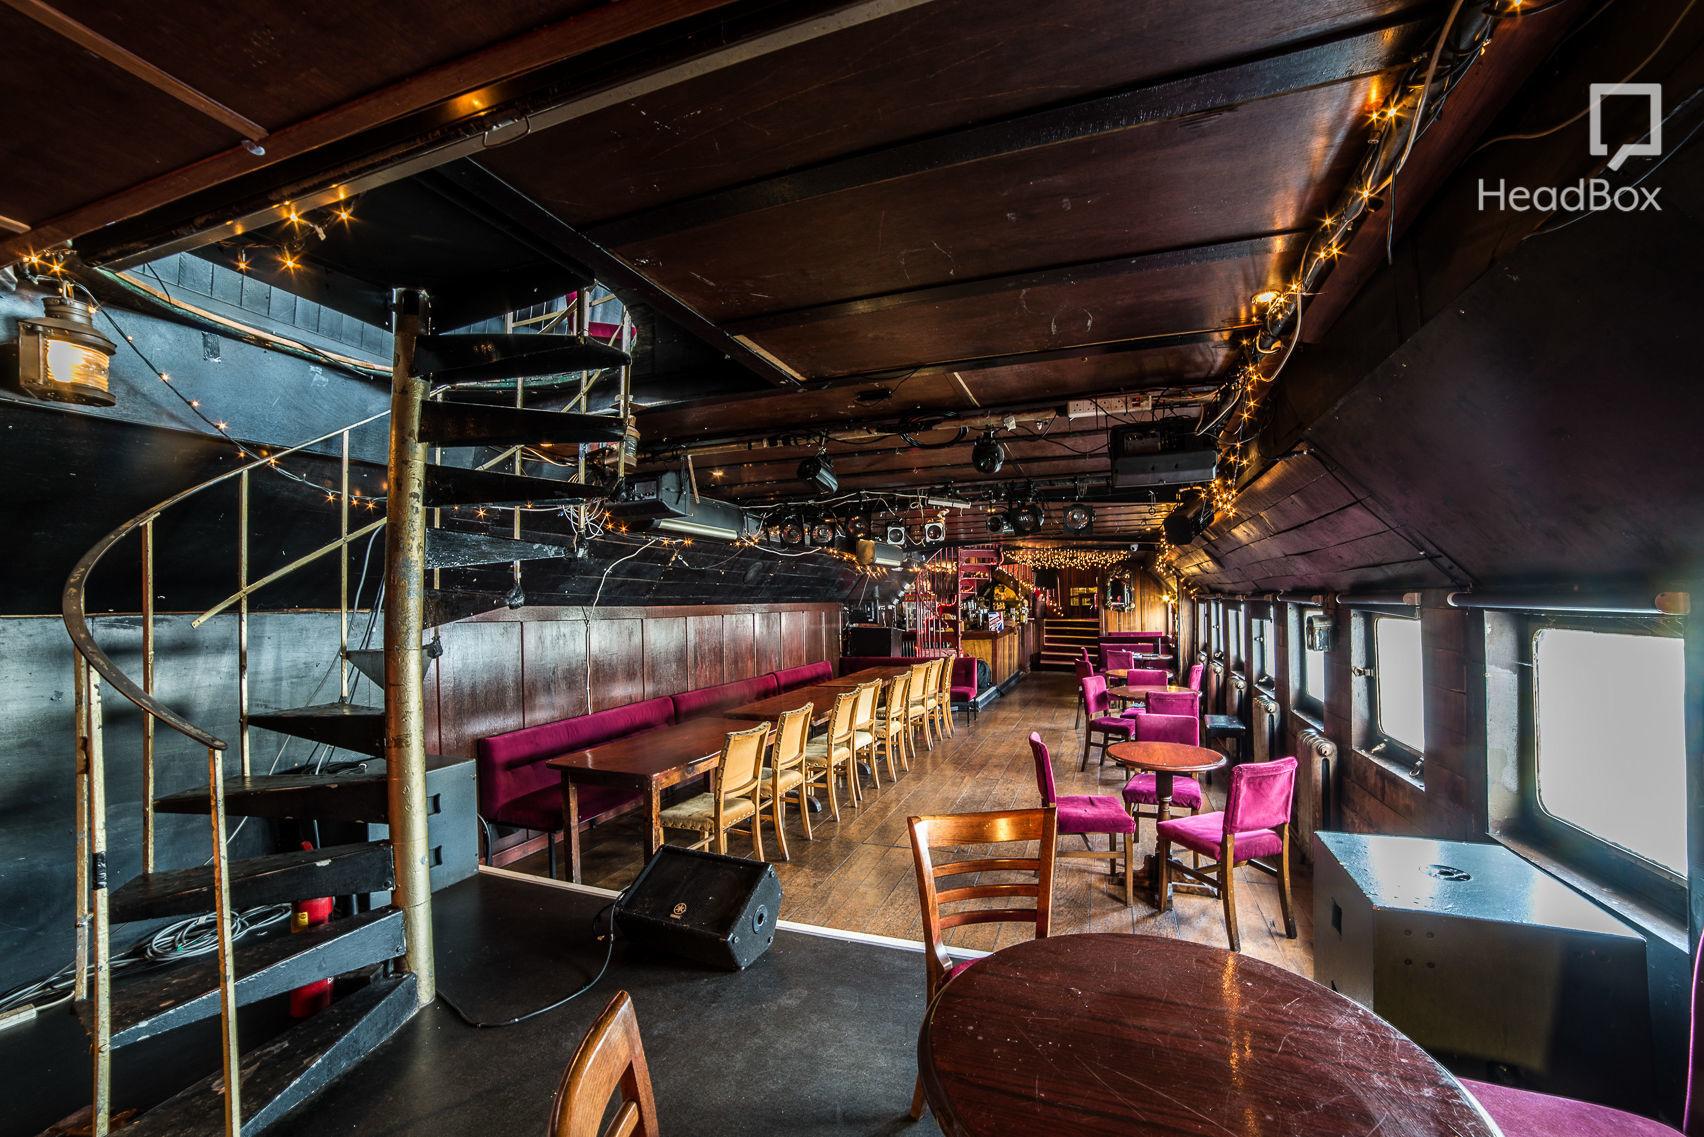 Lower Deck Hire, Battersea Barge